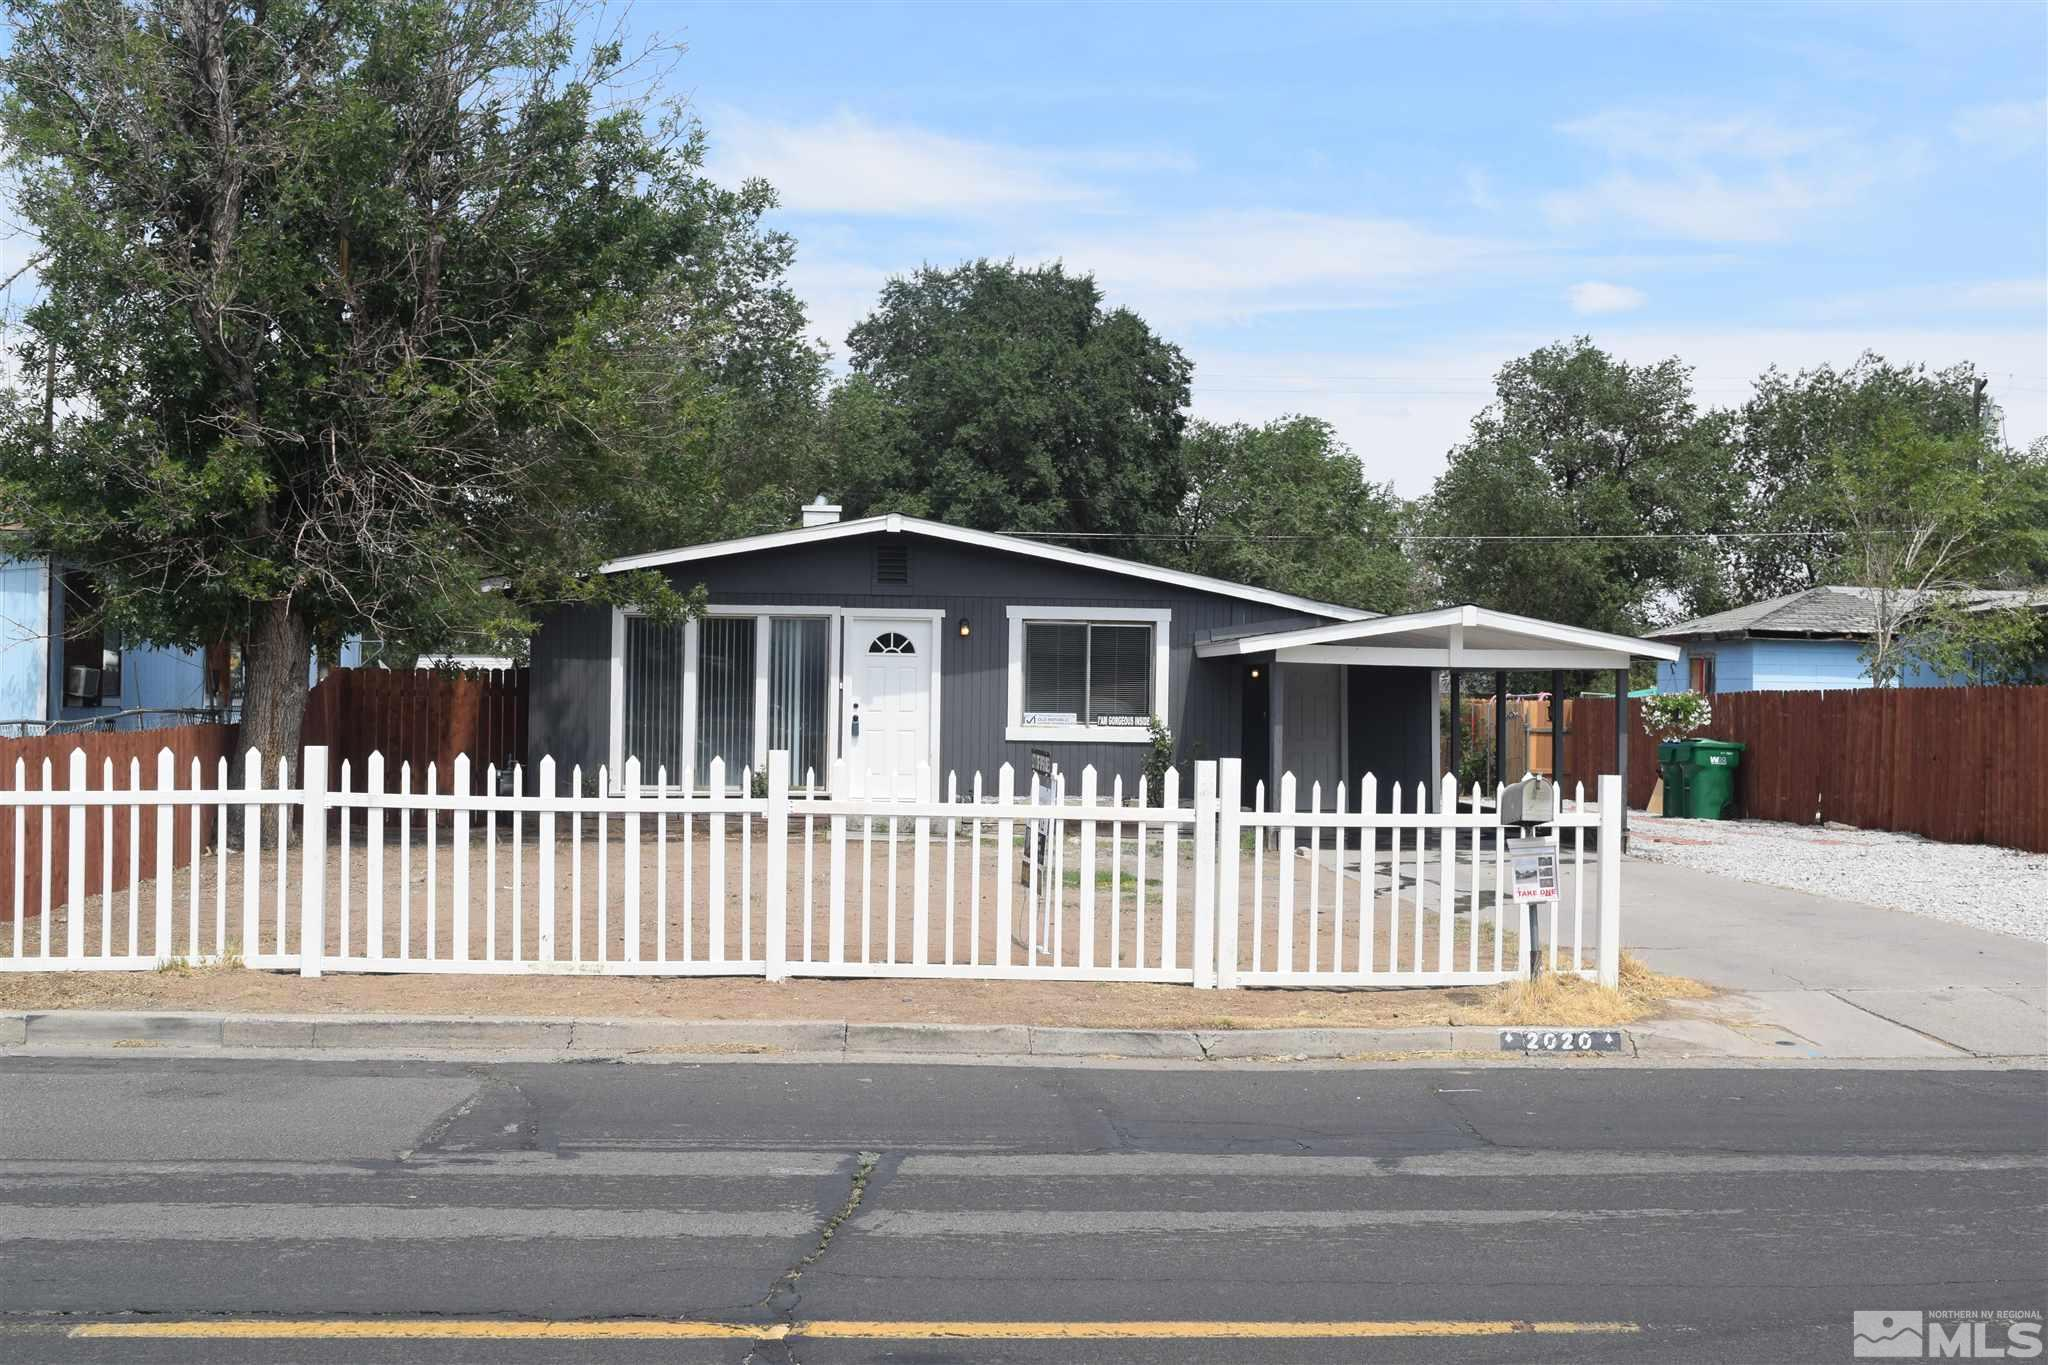 Image for 2020 Helena Avenue, Reno, NV 89512